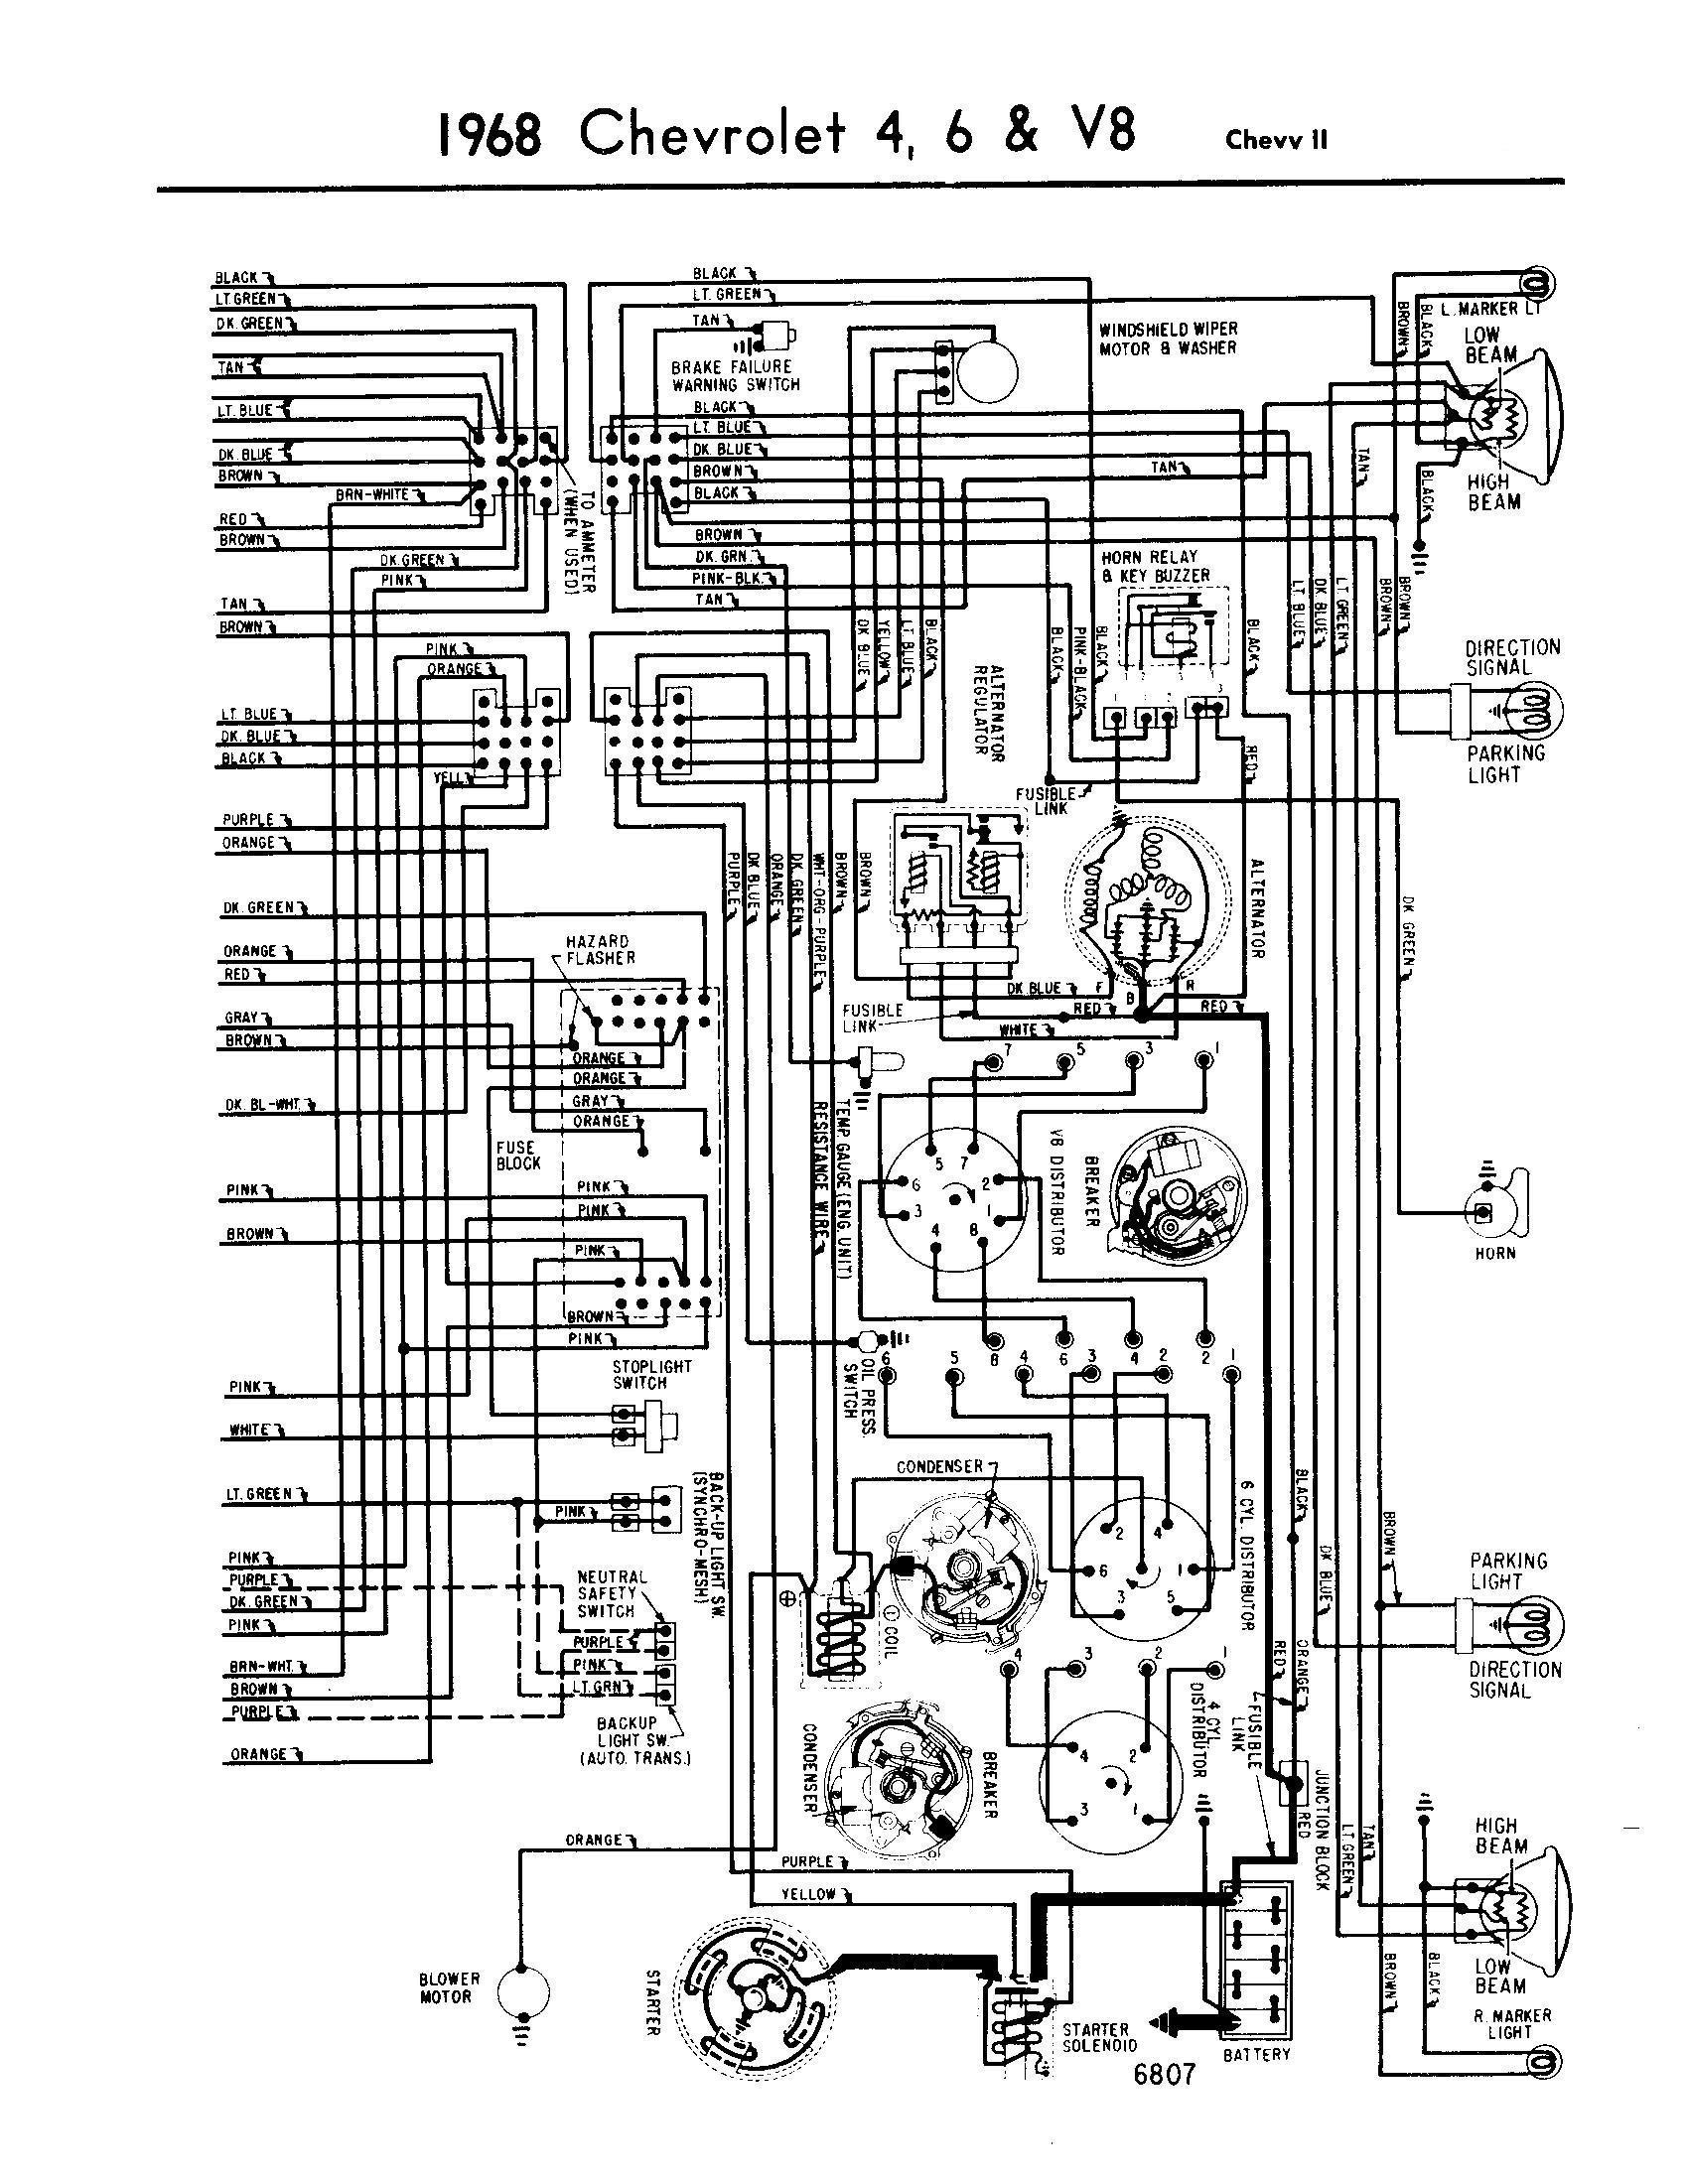 68 camaro engine wiring diagram tic toc tach wiring diagram wiring tic toc tach  wiring diagram